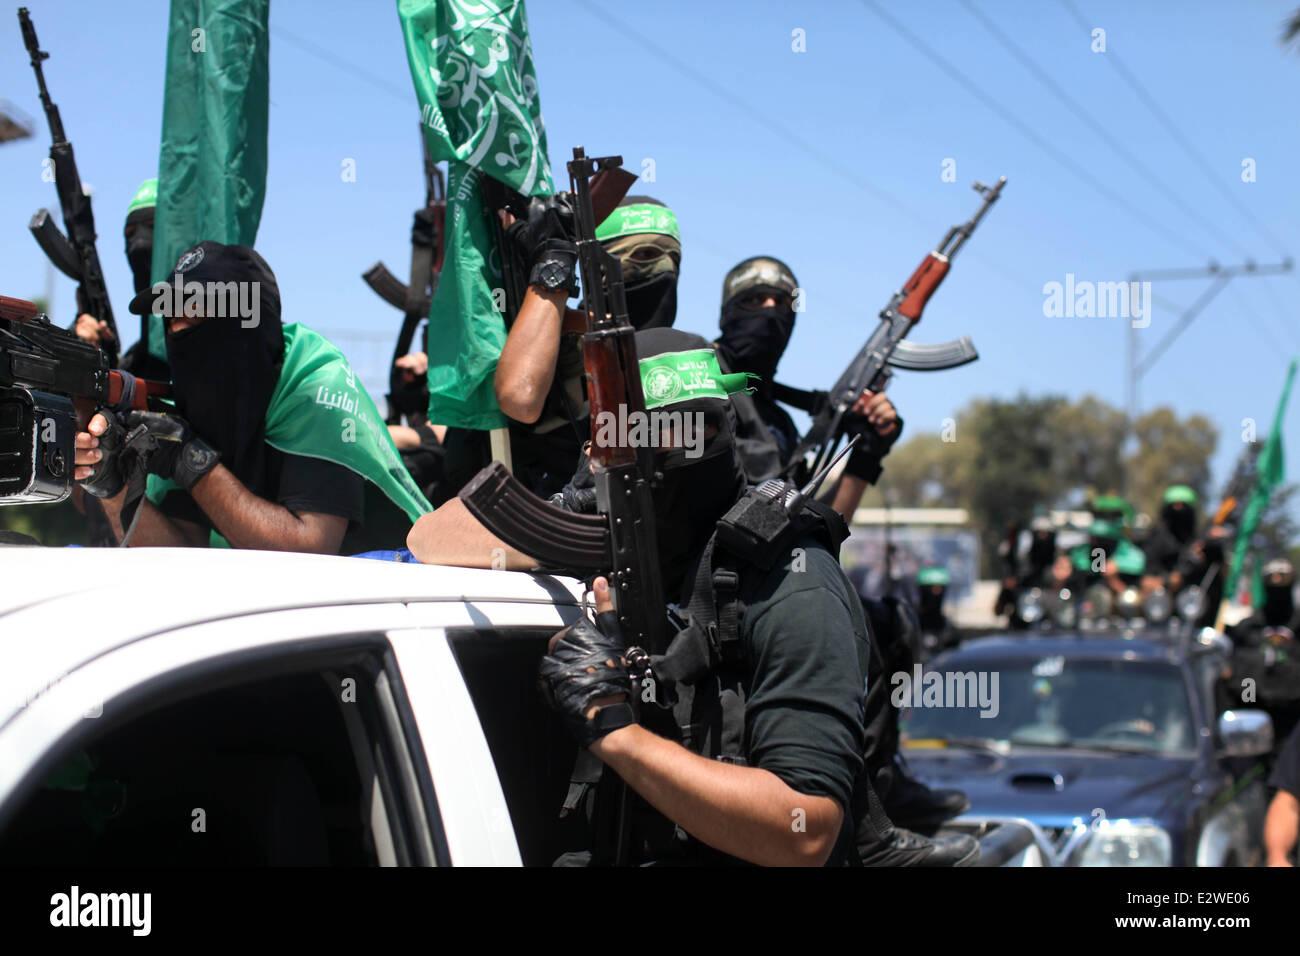 Gaza City, Gaza Strip. 21st June, 2014. Palestinian militants of the Ezzedine al-Qassam Brigades, Hamas's armed - Stock Image